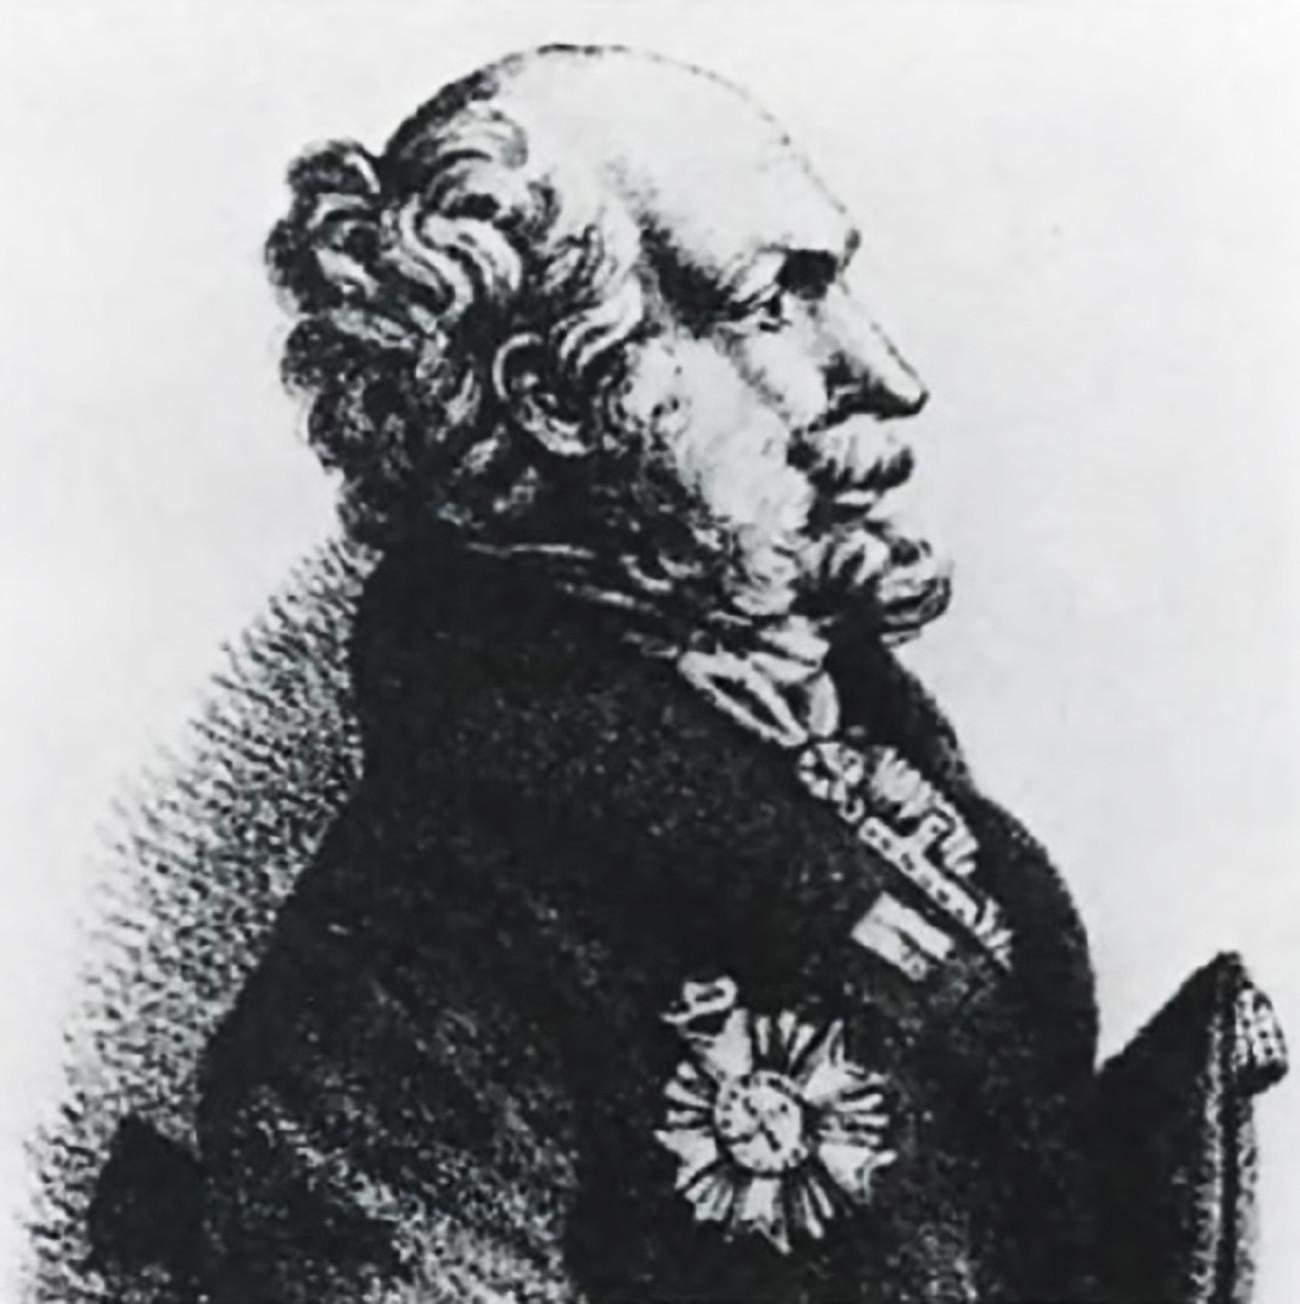 Il dottor George Sheffer